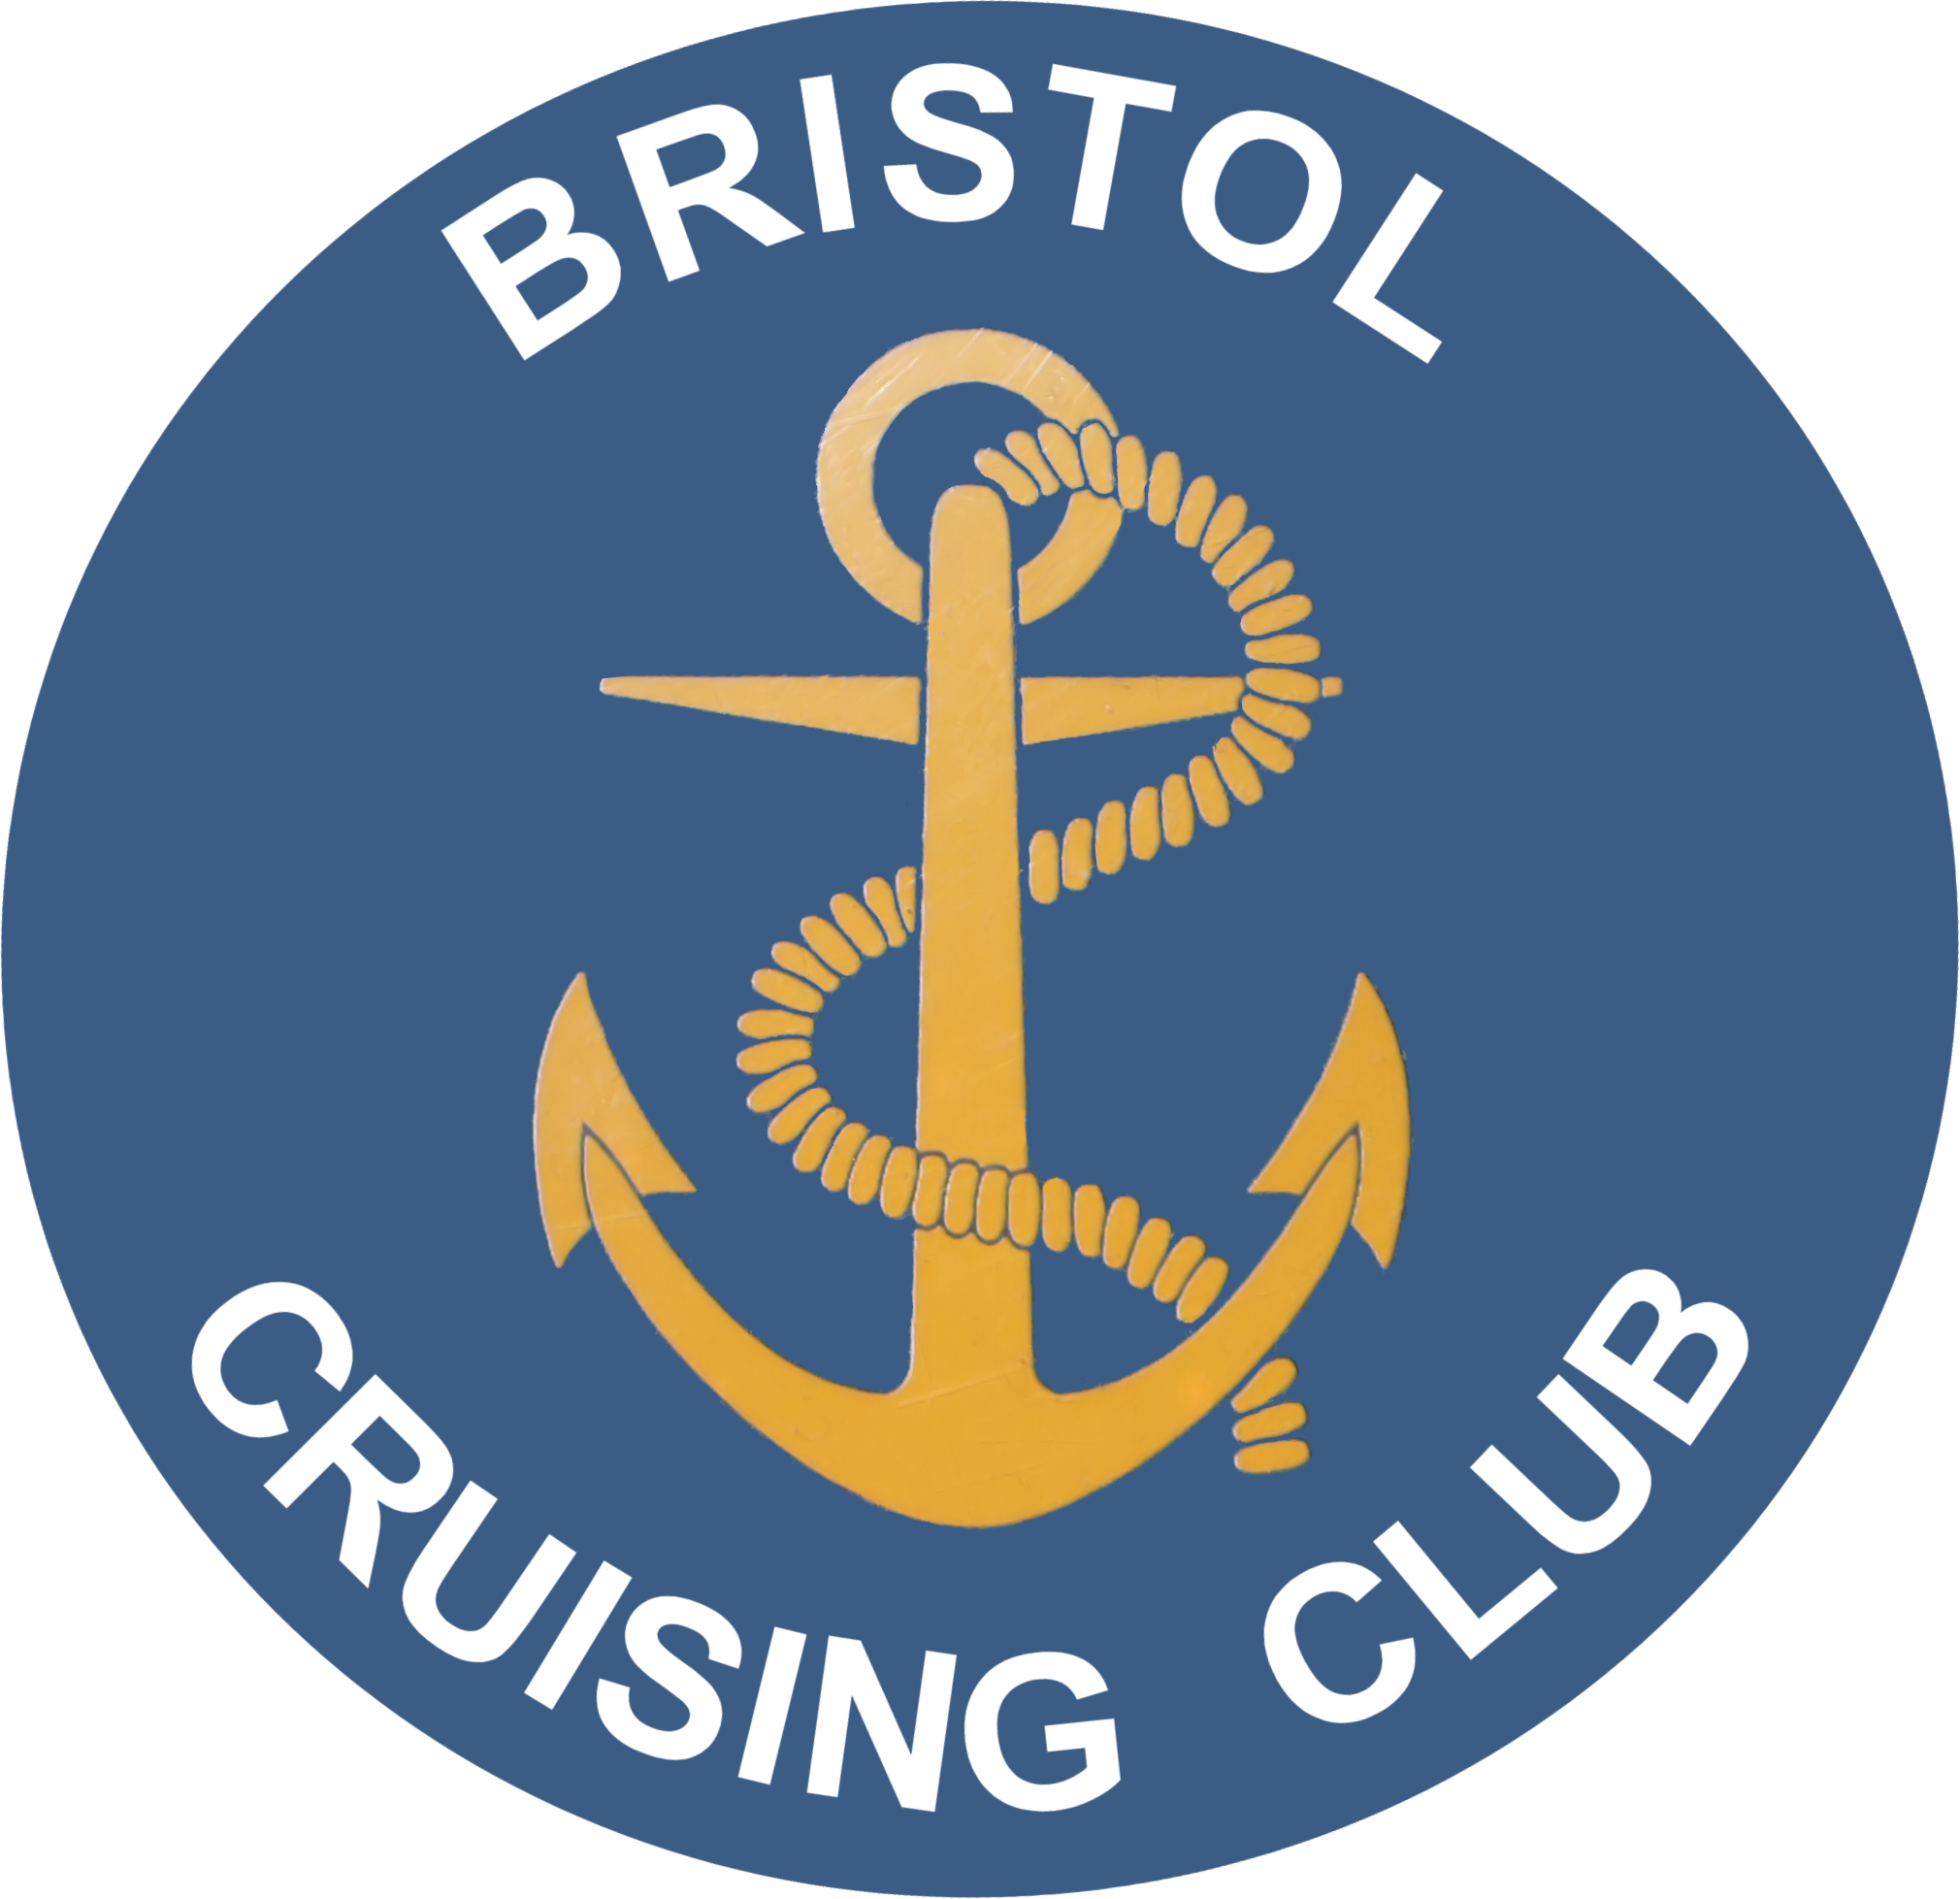 Bristol Cruising Club